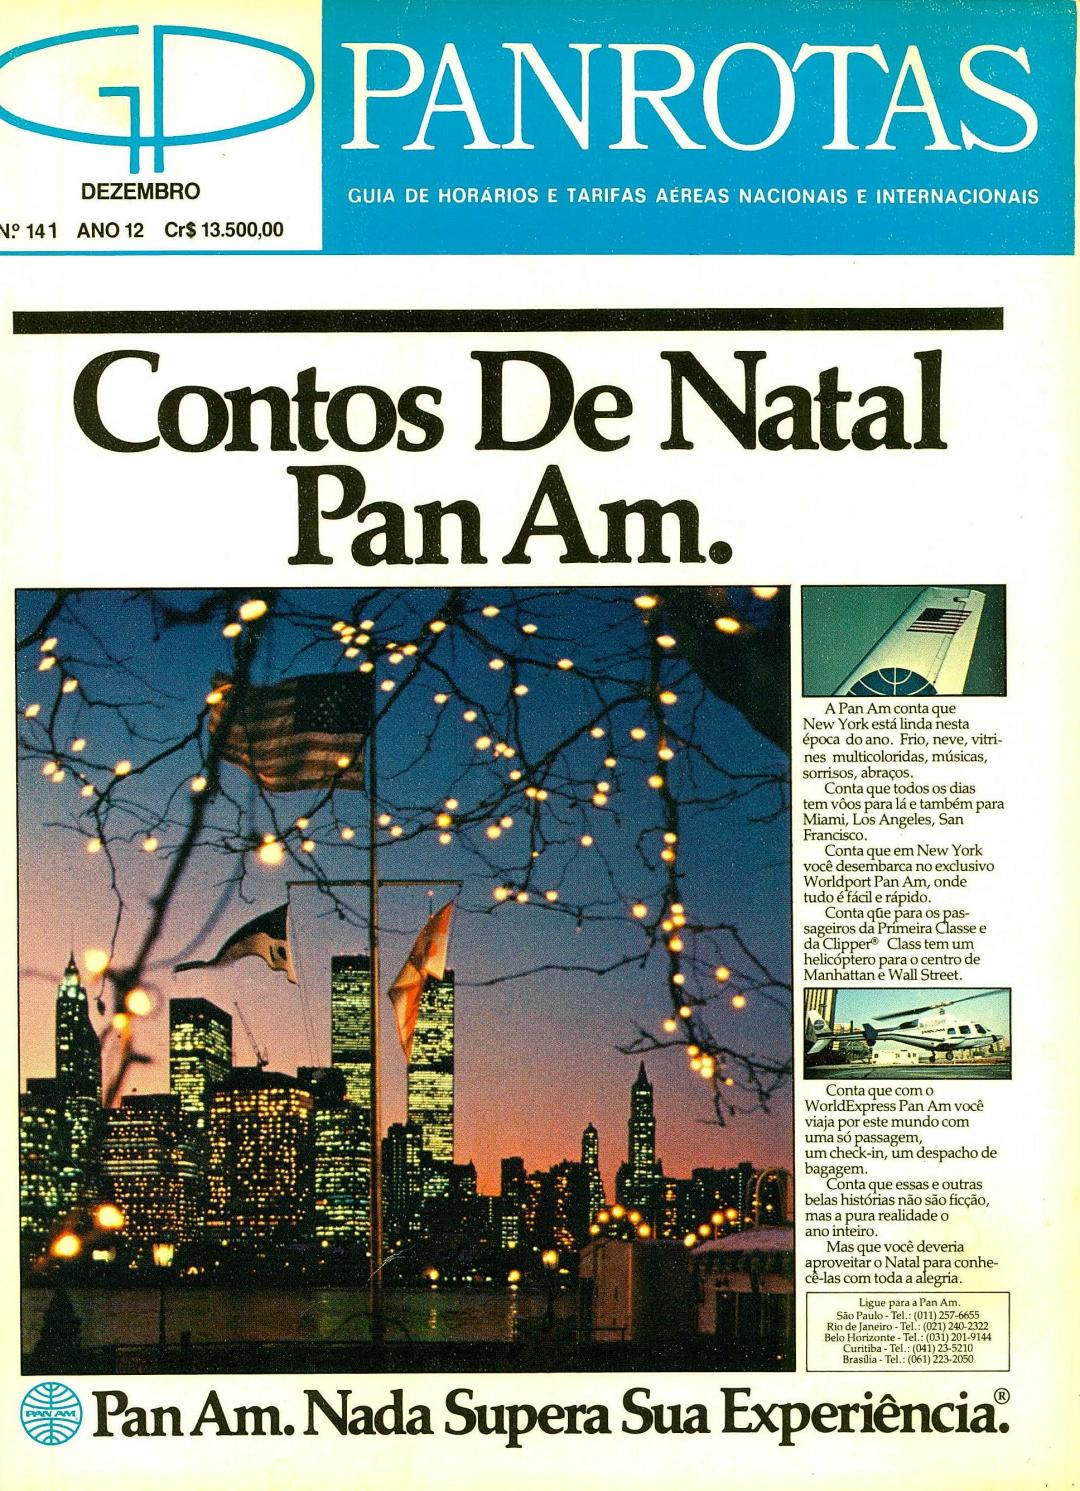 aa2f44a6c Guia PANROTAS - Edição 141 - Dezembro 1984 by PANROTAS Editora - issuu